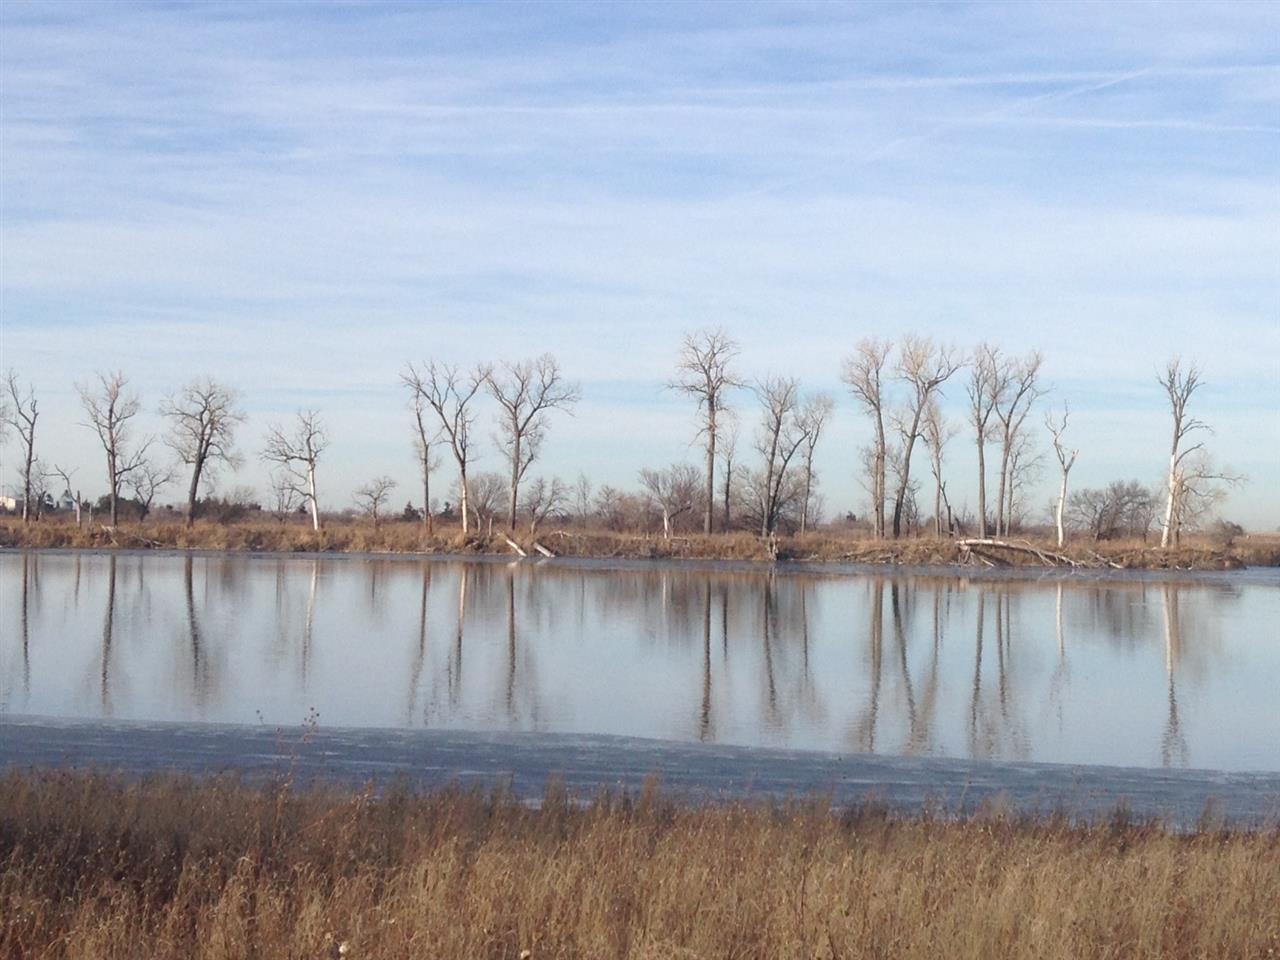 DeSoto National Wildlife Refuge Missouri Valley IA